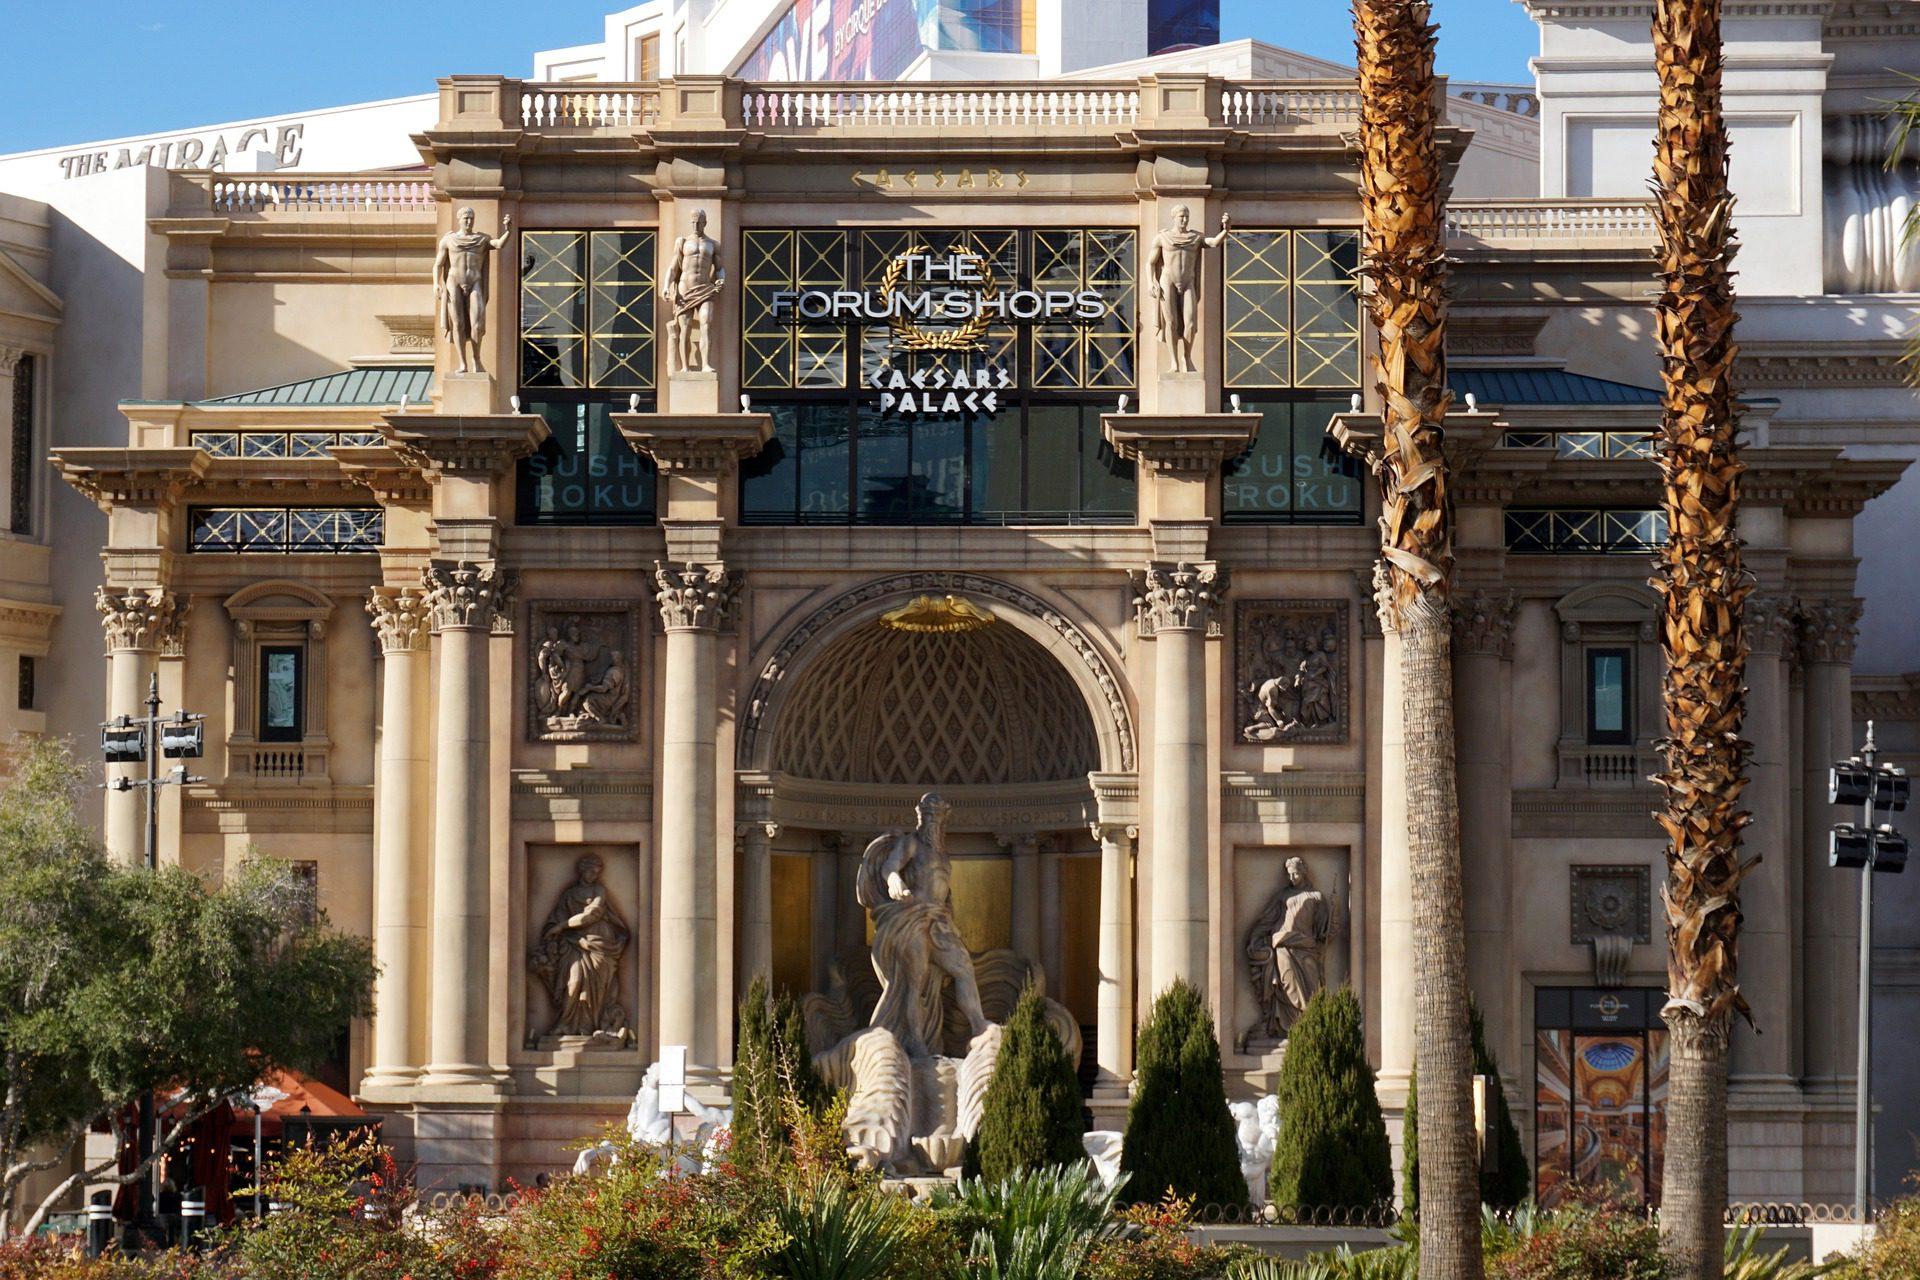 Forum Shops at Caesars Palace, Las Vegas